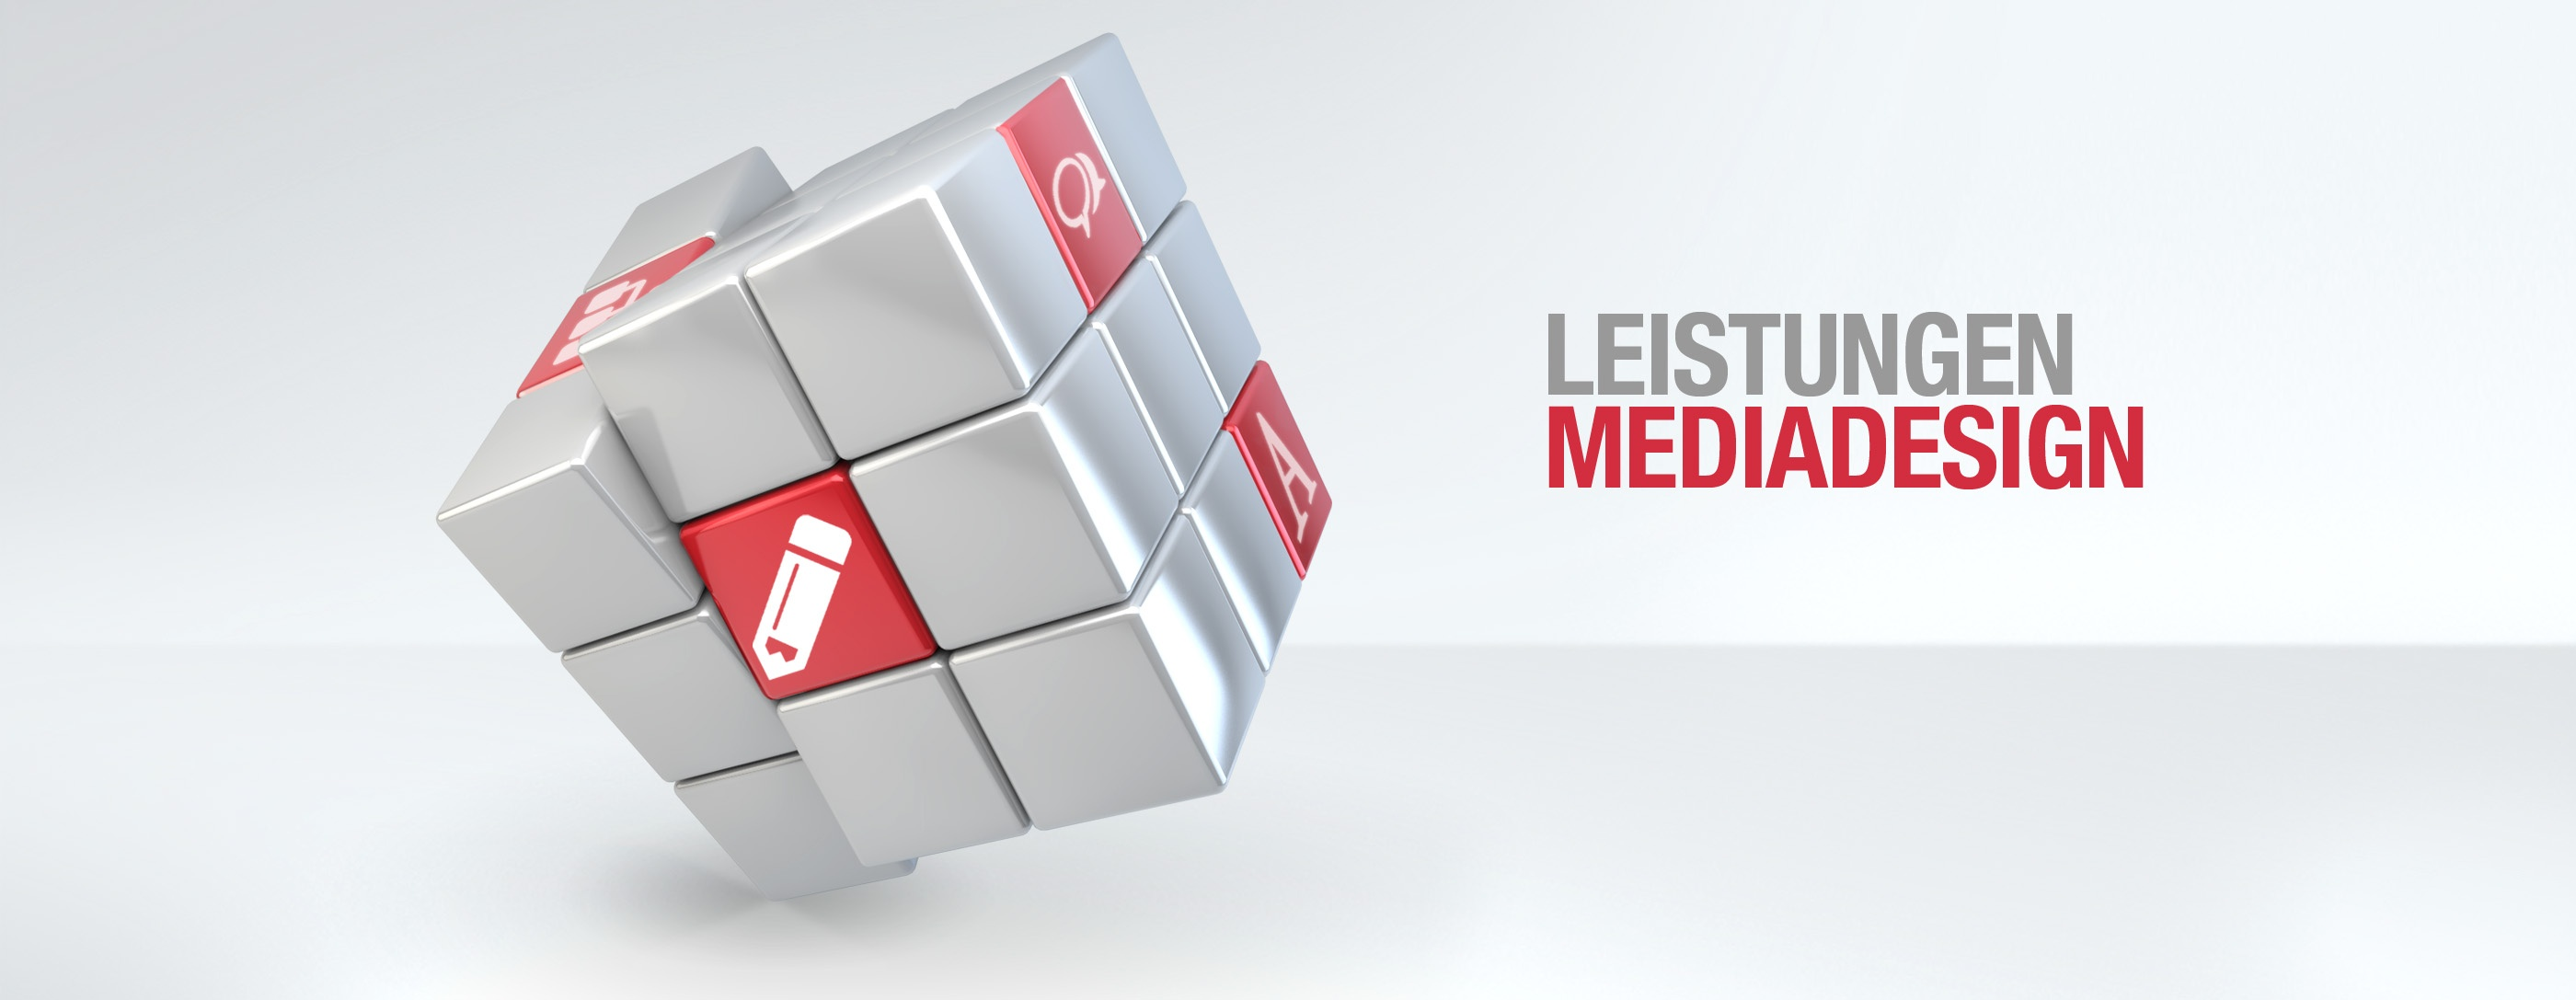 Leistungen_Mediadesign.jpg